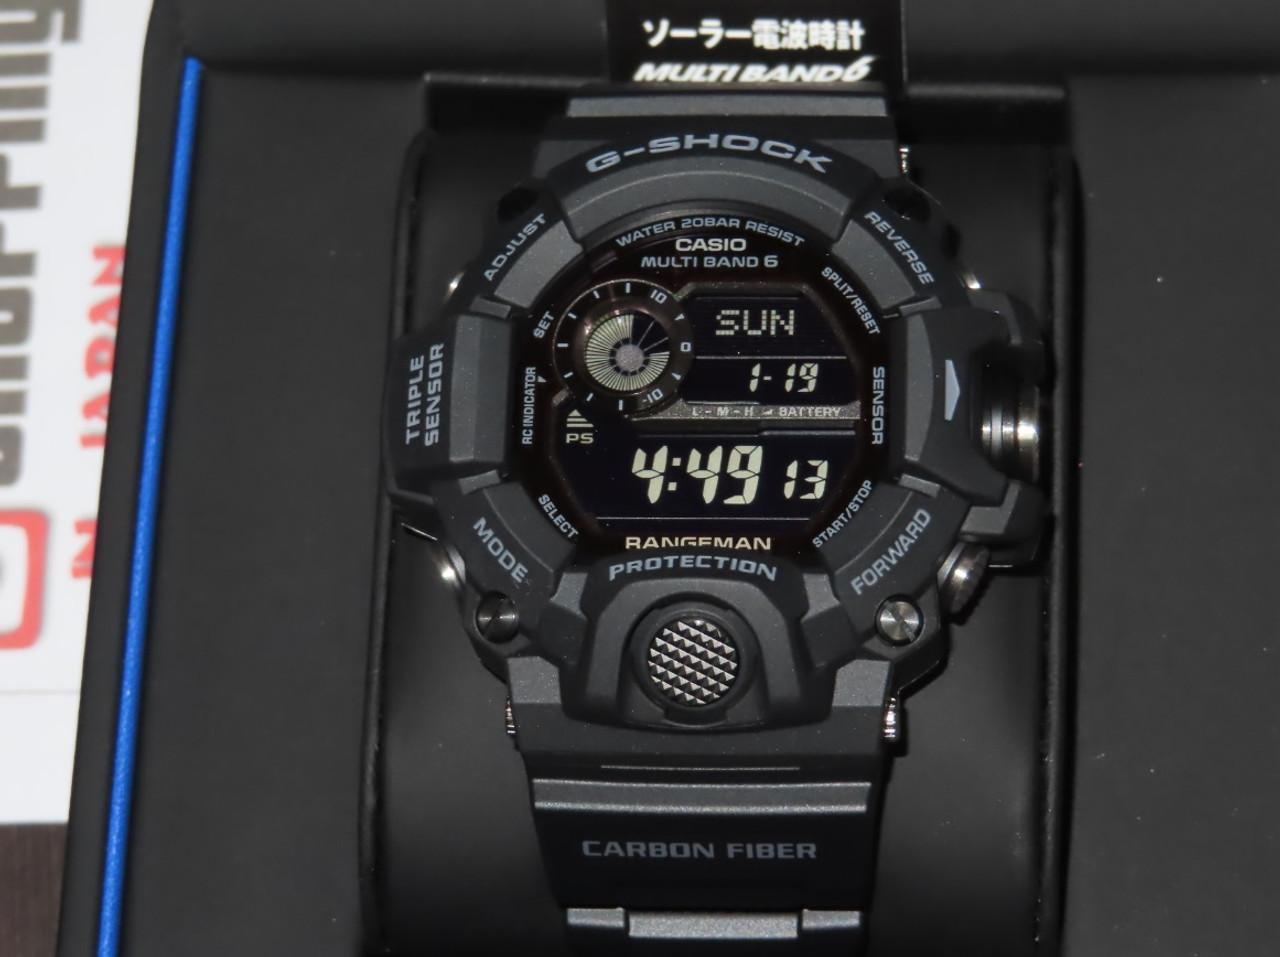 Casio Rangeman GW-9400J-1BJF Black Out Carbon